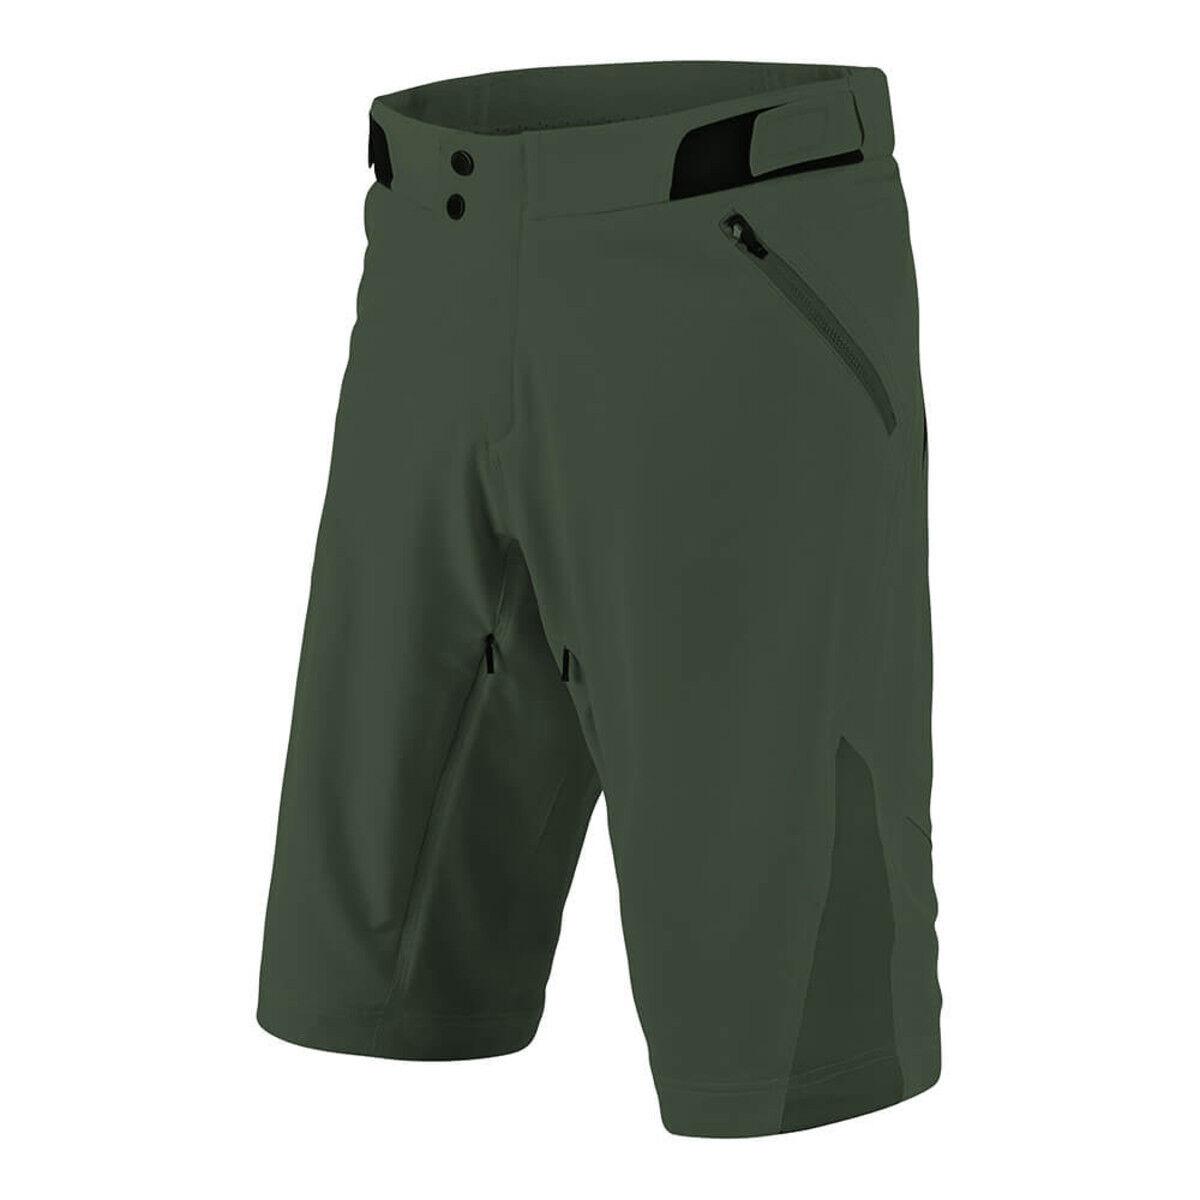 Troy Lee Designs Mountain Bike Shorts RUCKUS SHORT SHELL; TROOPER 36